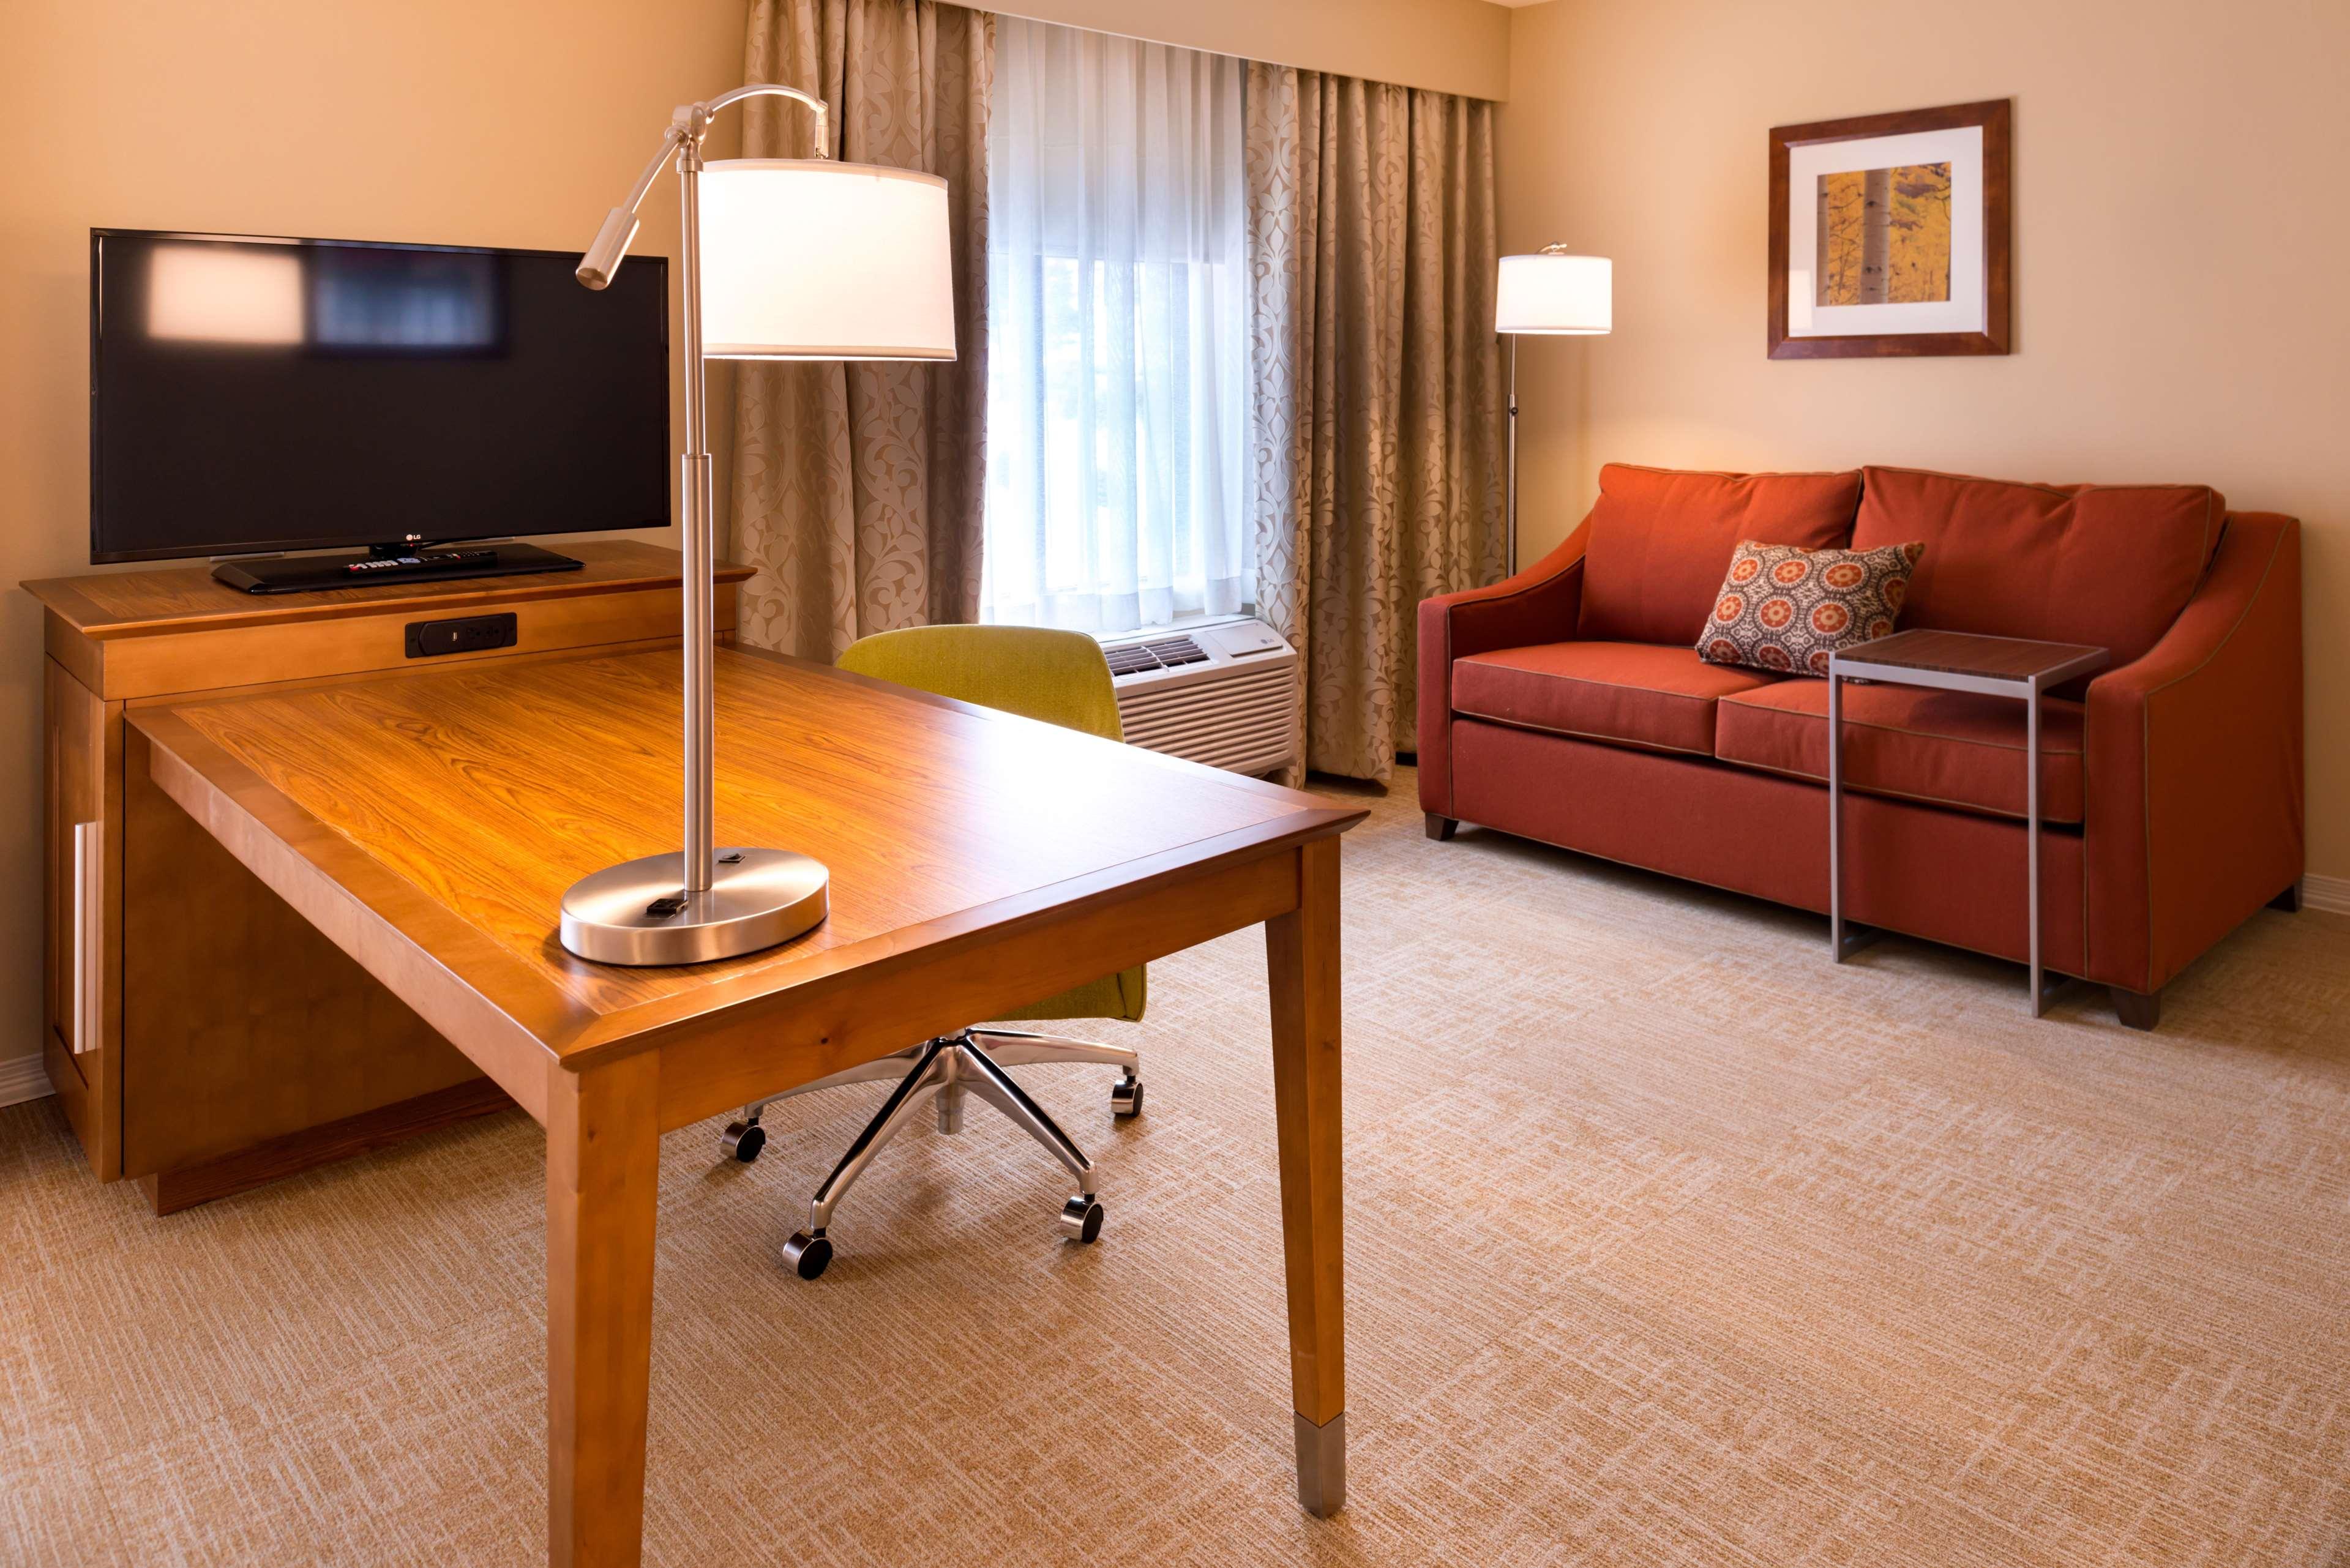 Hampton Inn & Suites Silverthorne image 19